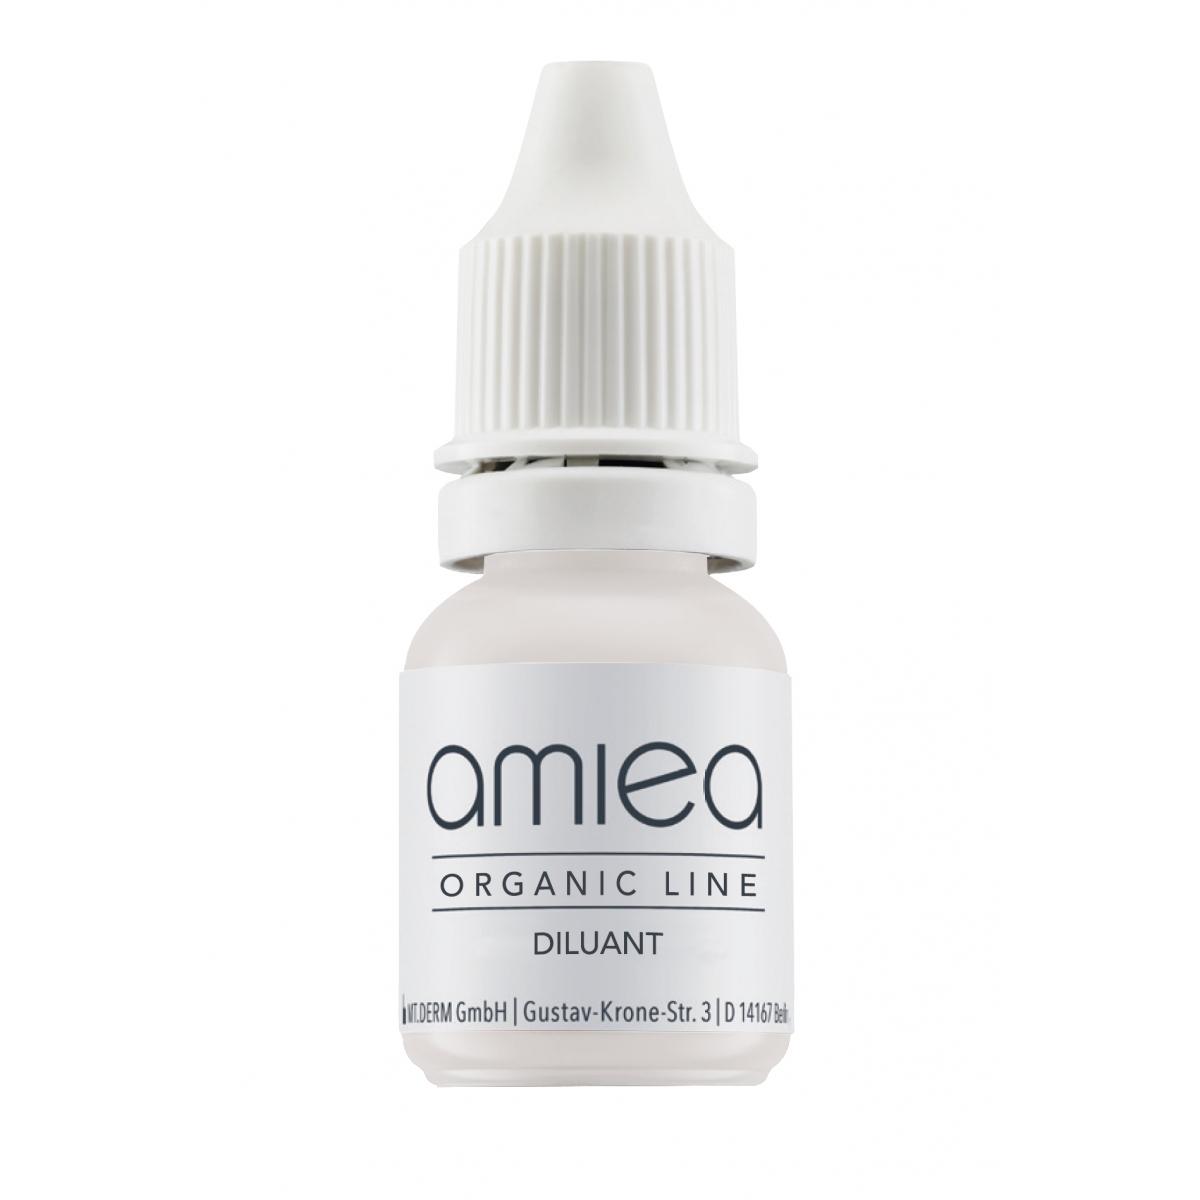 ORGANIC LINE (10ml) - DILUANT PIGMENT ORGANICLINE AMIEA (10 ml)